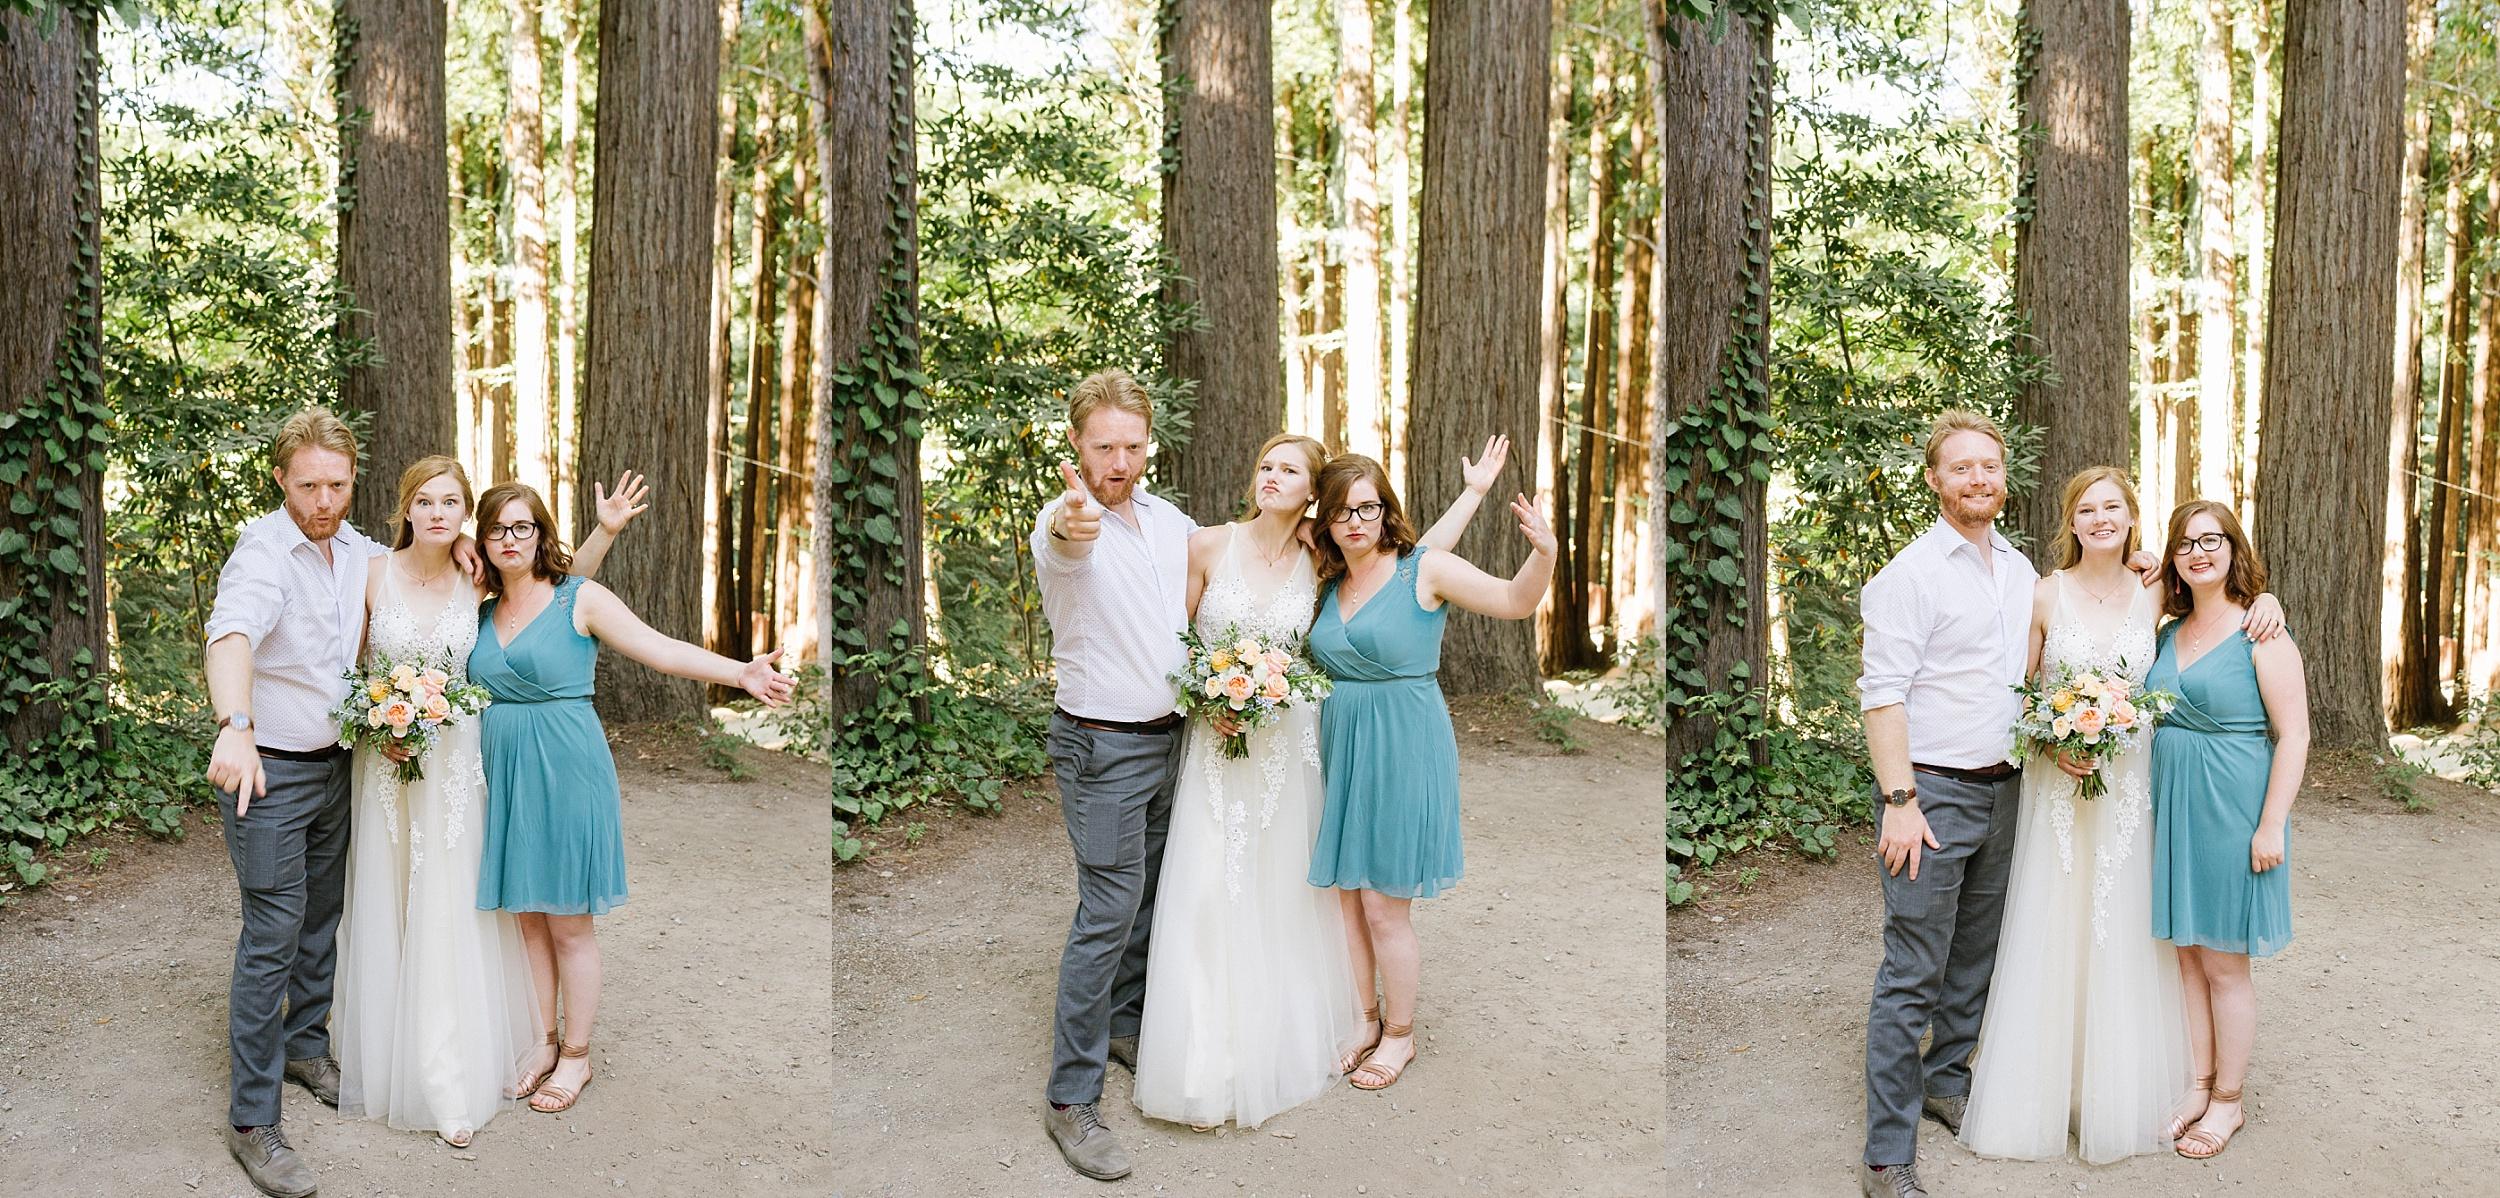 Amphitheatre-of-the-Redwoods-wedding-erikariley_chelsea-dier-photography_0026.jpg